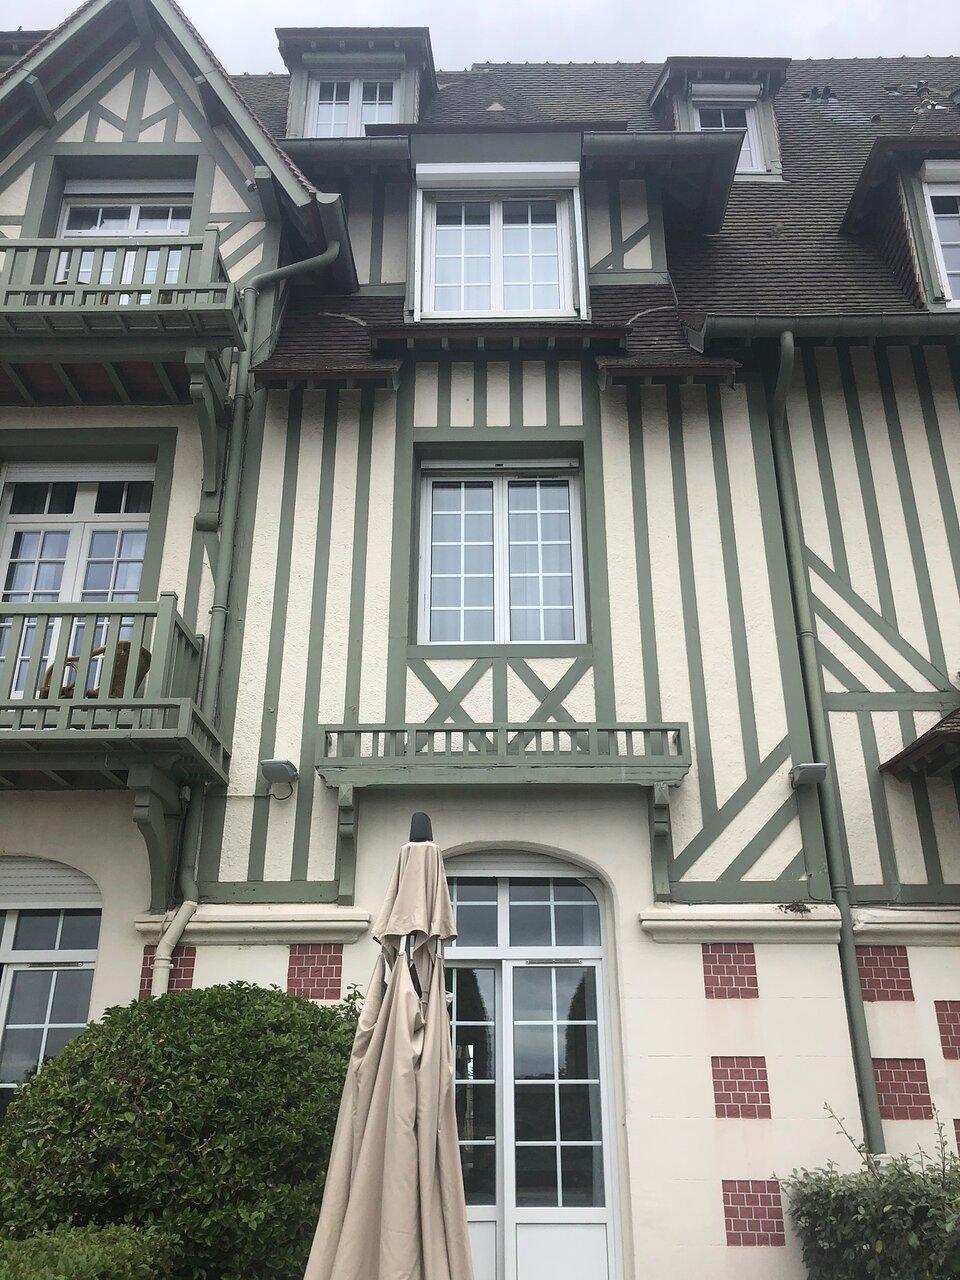 Hotel Barriere Le Normandy Deauville Franca Normandia 1 371 Fotos Comparacao De Precos E Avaliacoes